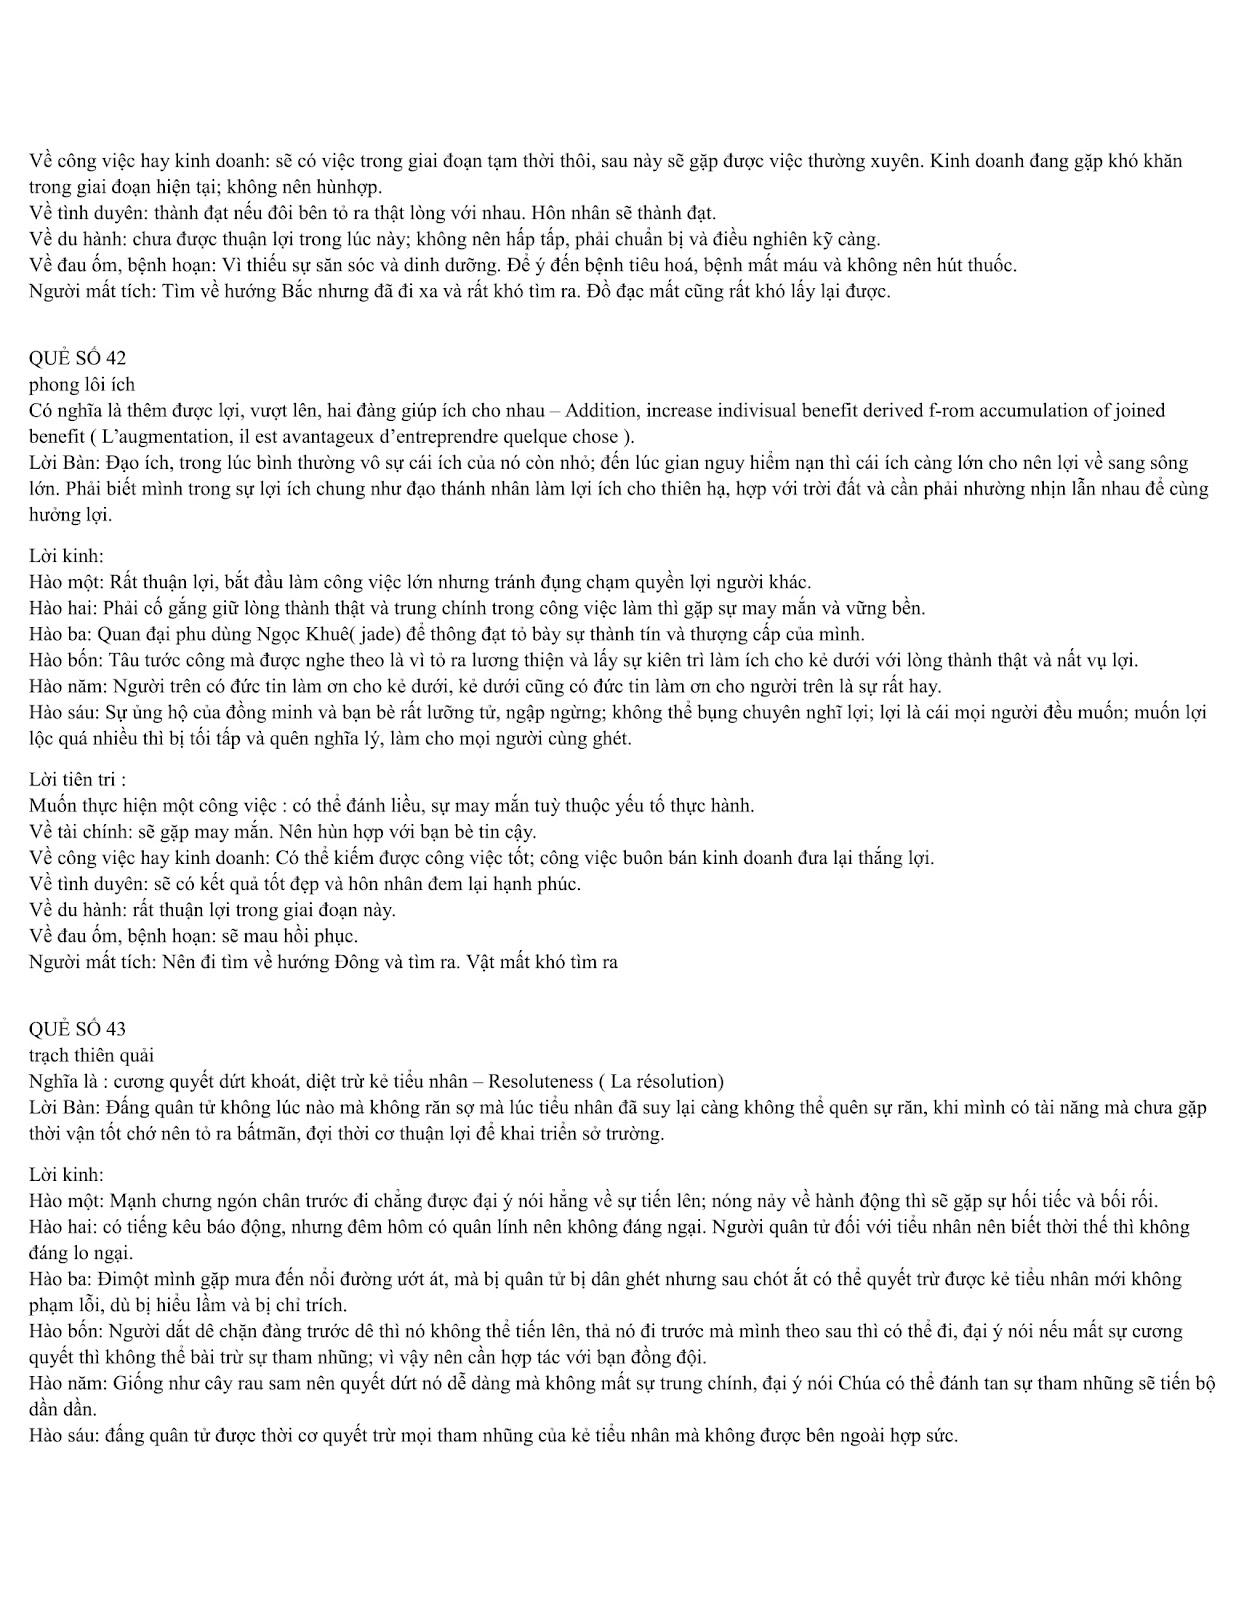 QUẺ SỐ 1-22.jpg